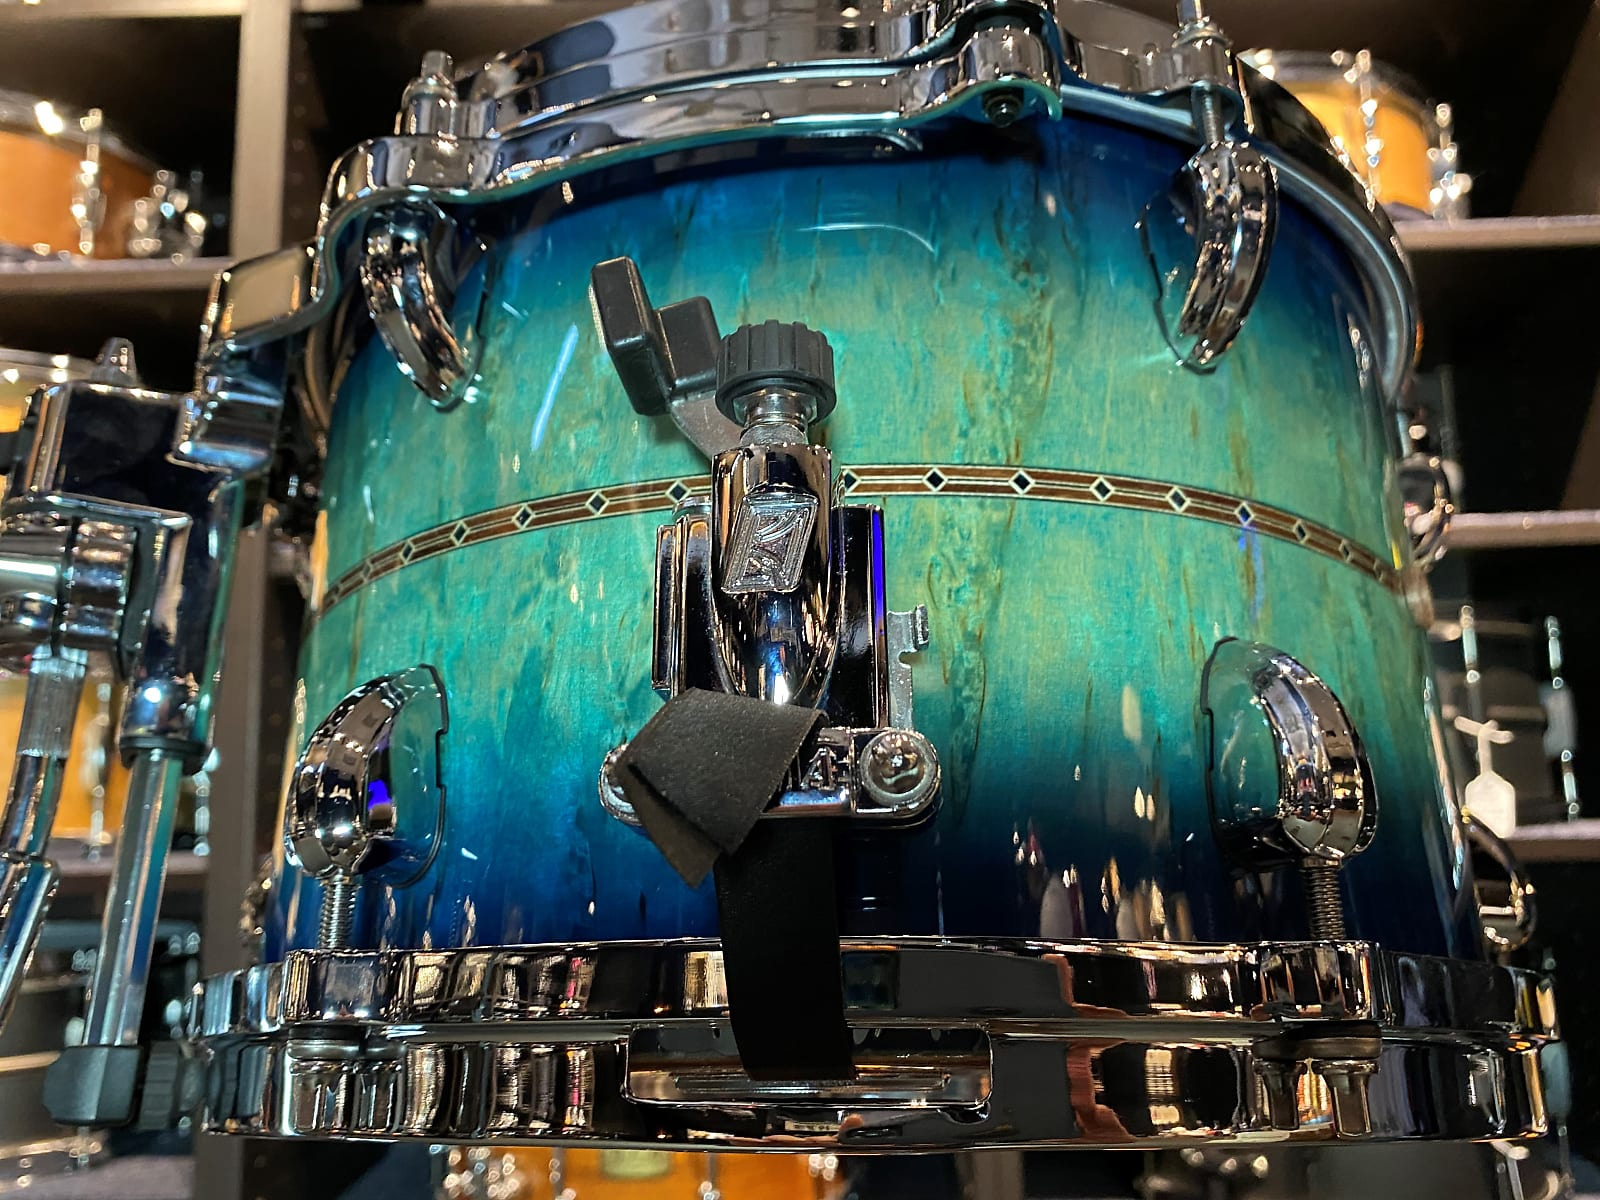 Tama drums sets Star Bubinga custom 8x12 side snare drum